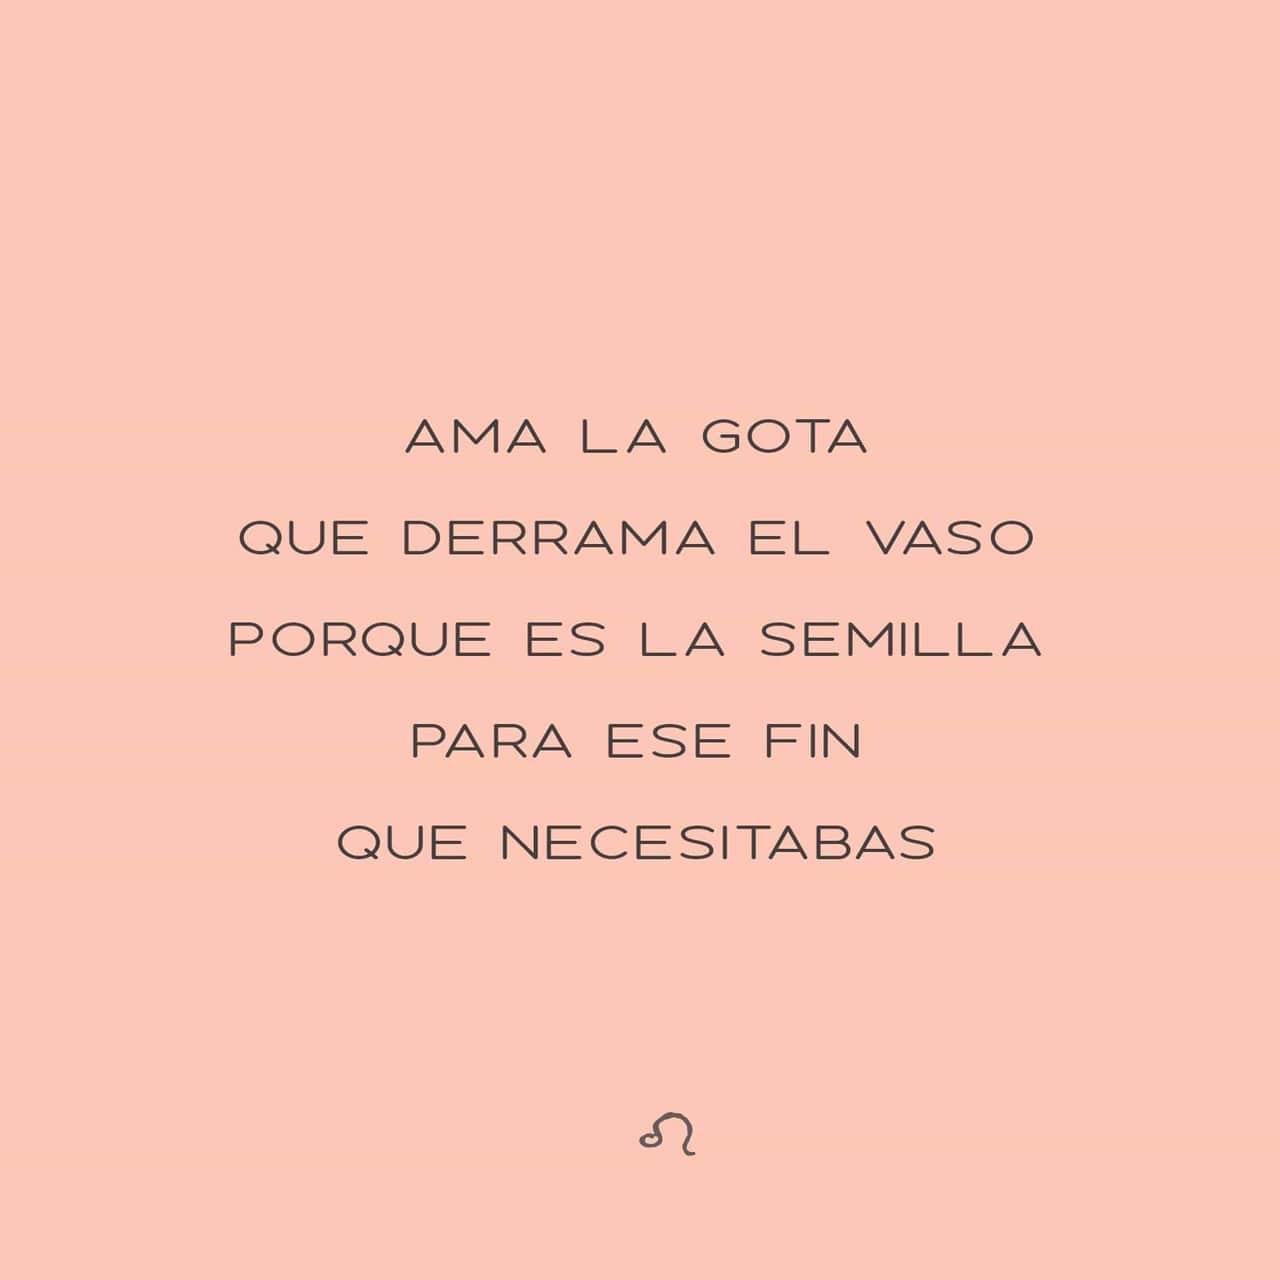 Frases Español Uploaded By ᴇʟʟᴀ On We Heart It